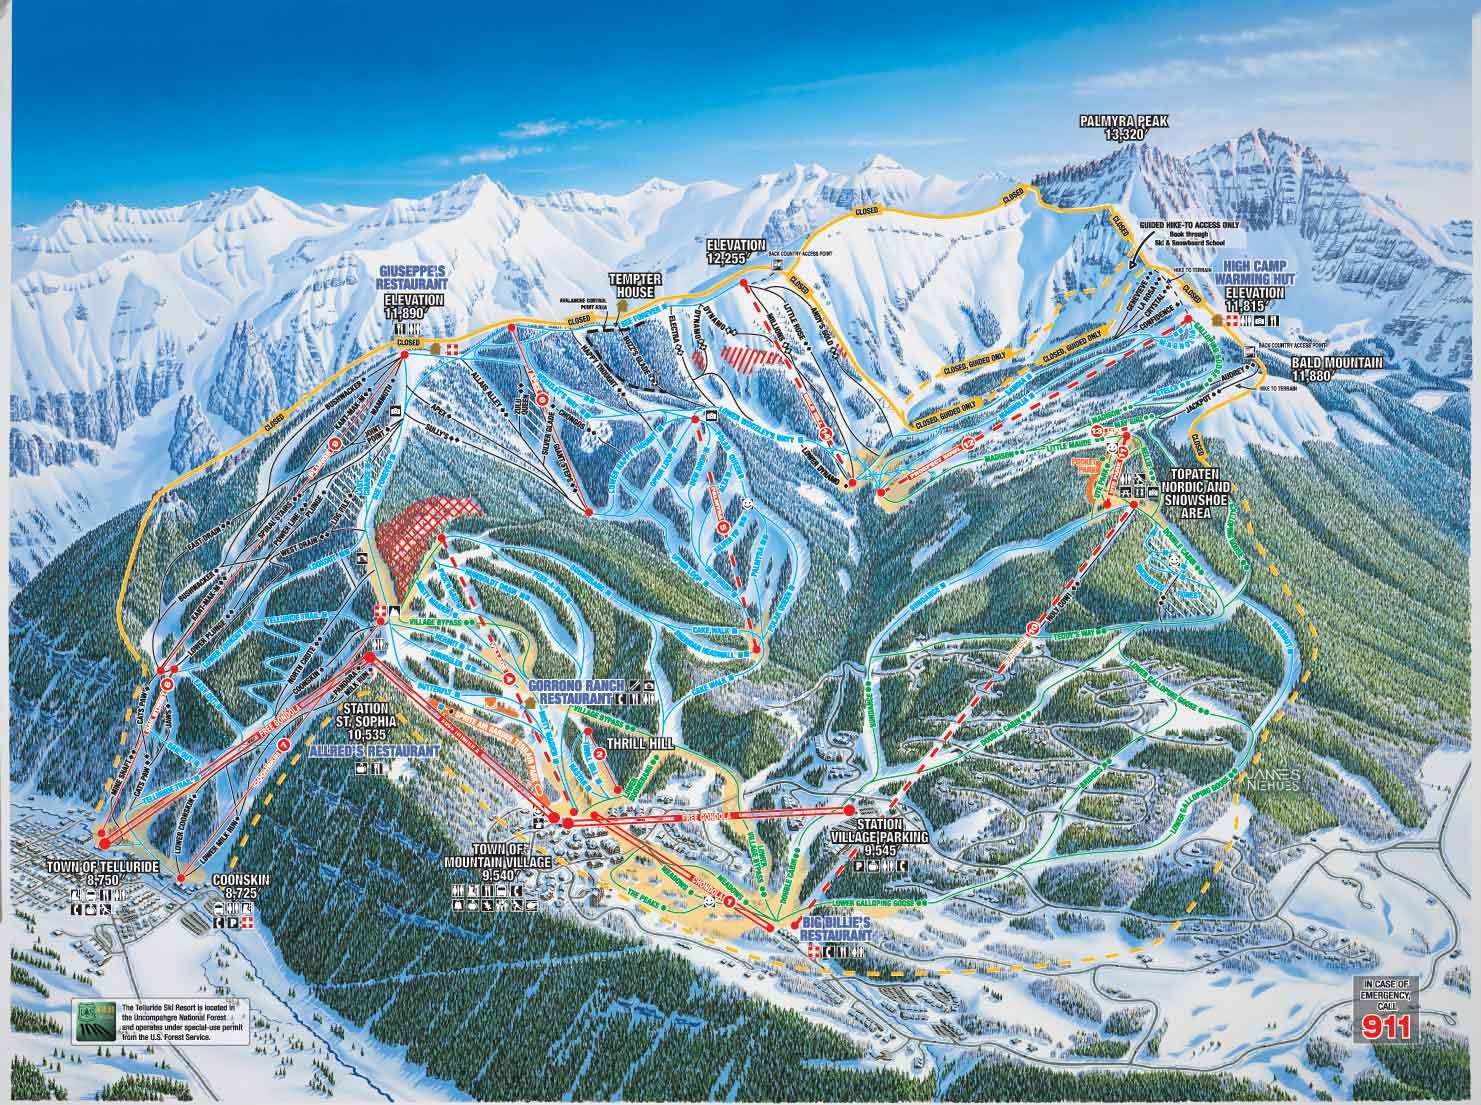 Purdue Ski And Snowboard Club